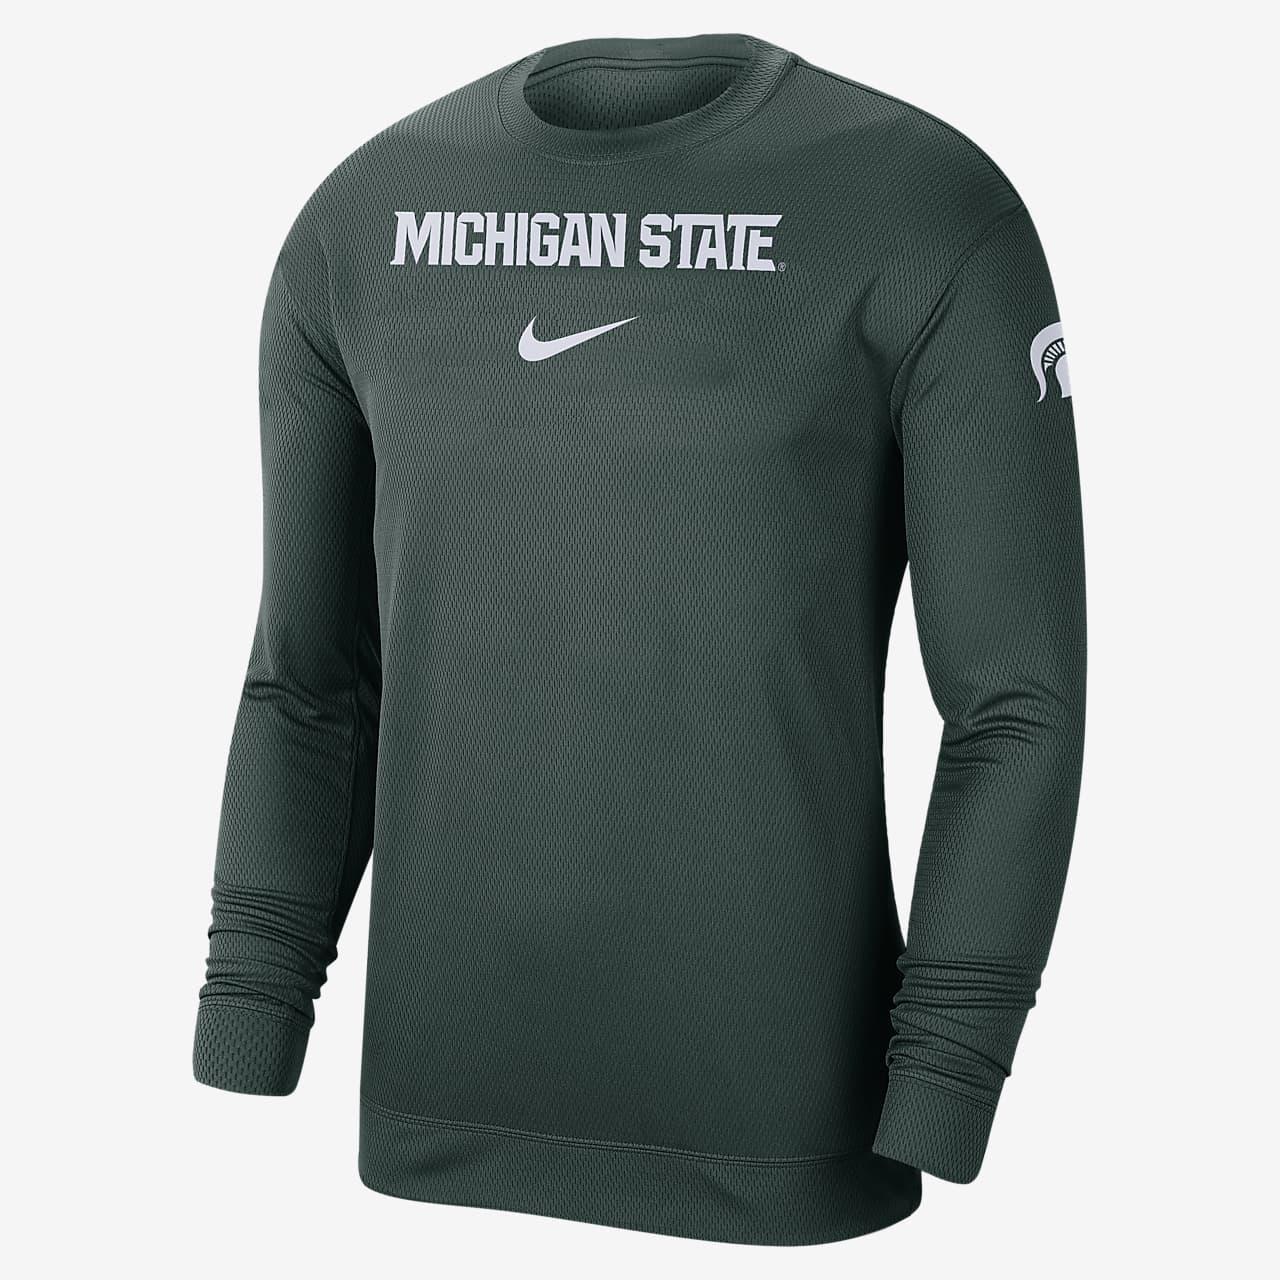 Nike College Dri-FIT Spotlight (Michigan State) Men's Long-Sleeve Top